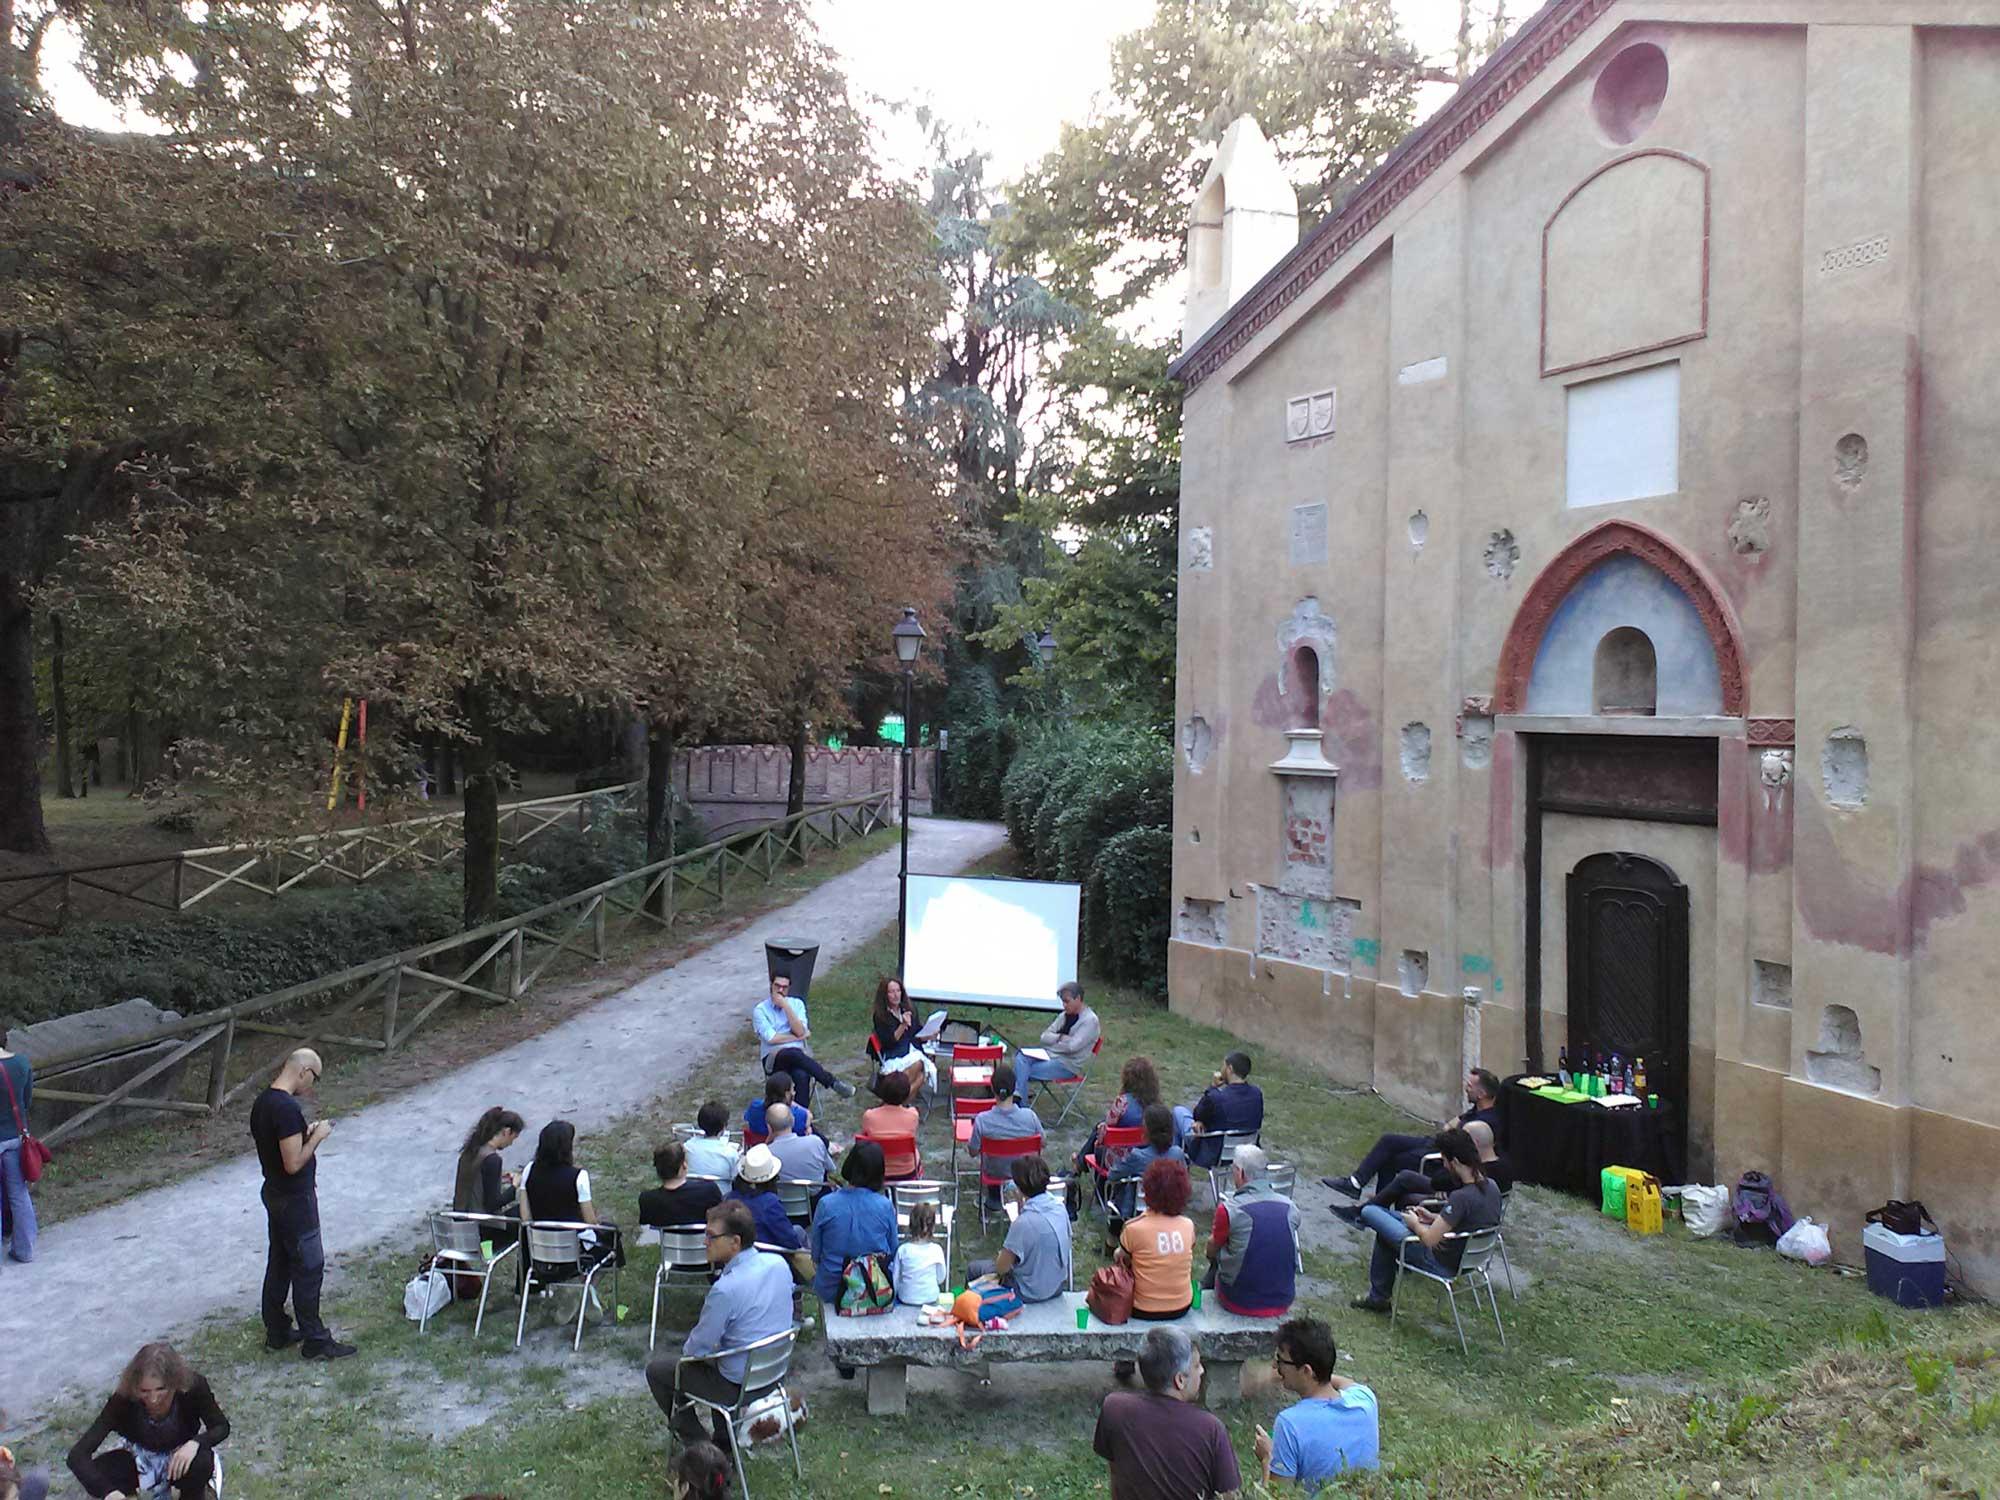 conferenza in giardino